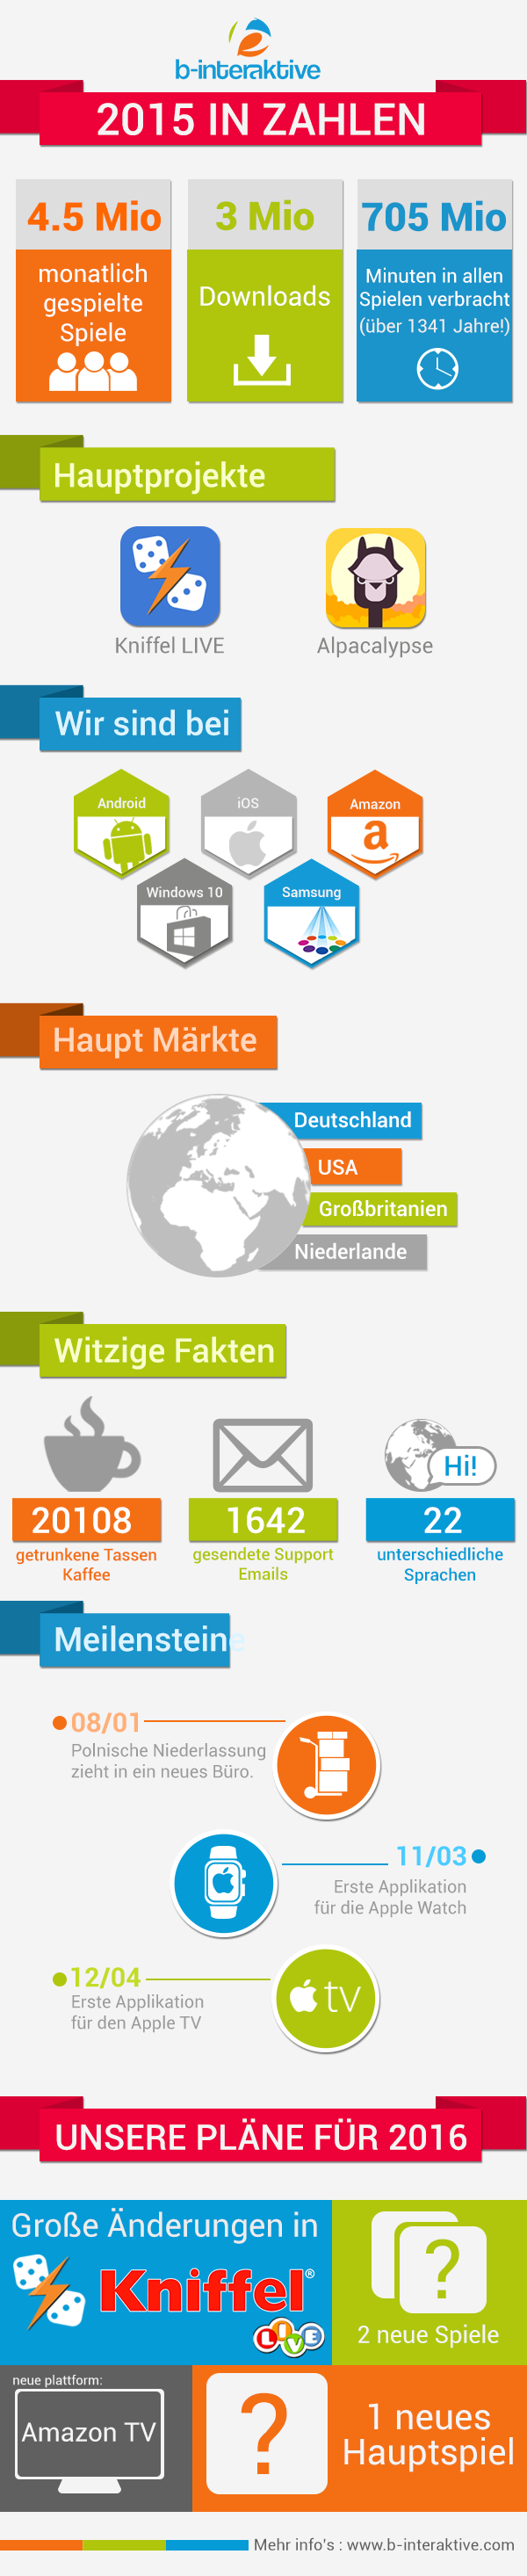 infographic_ge